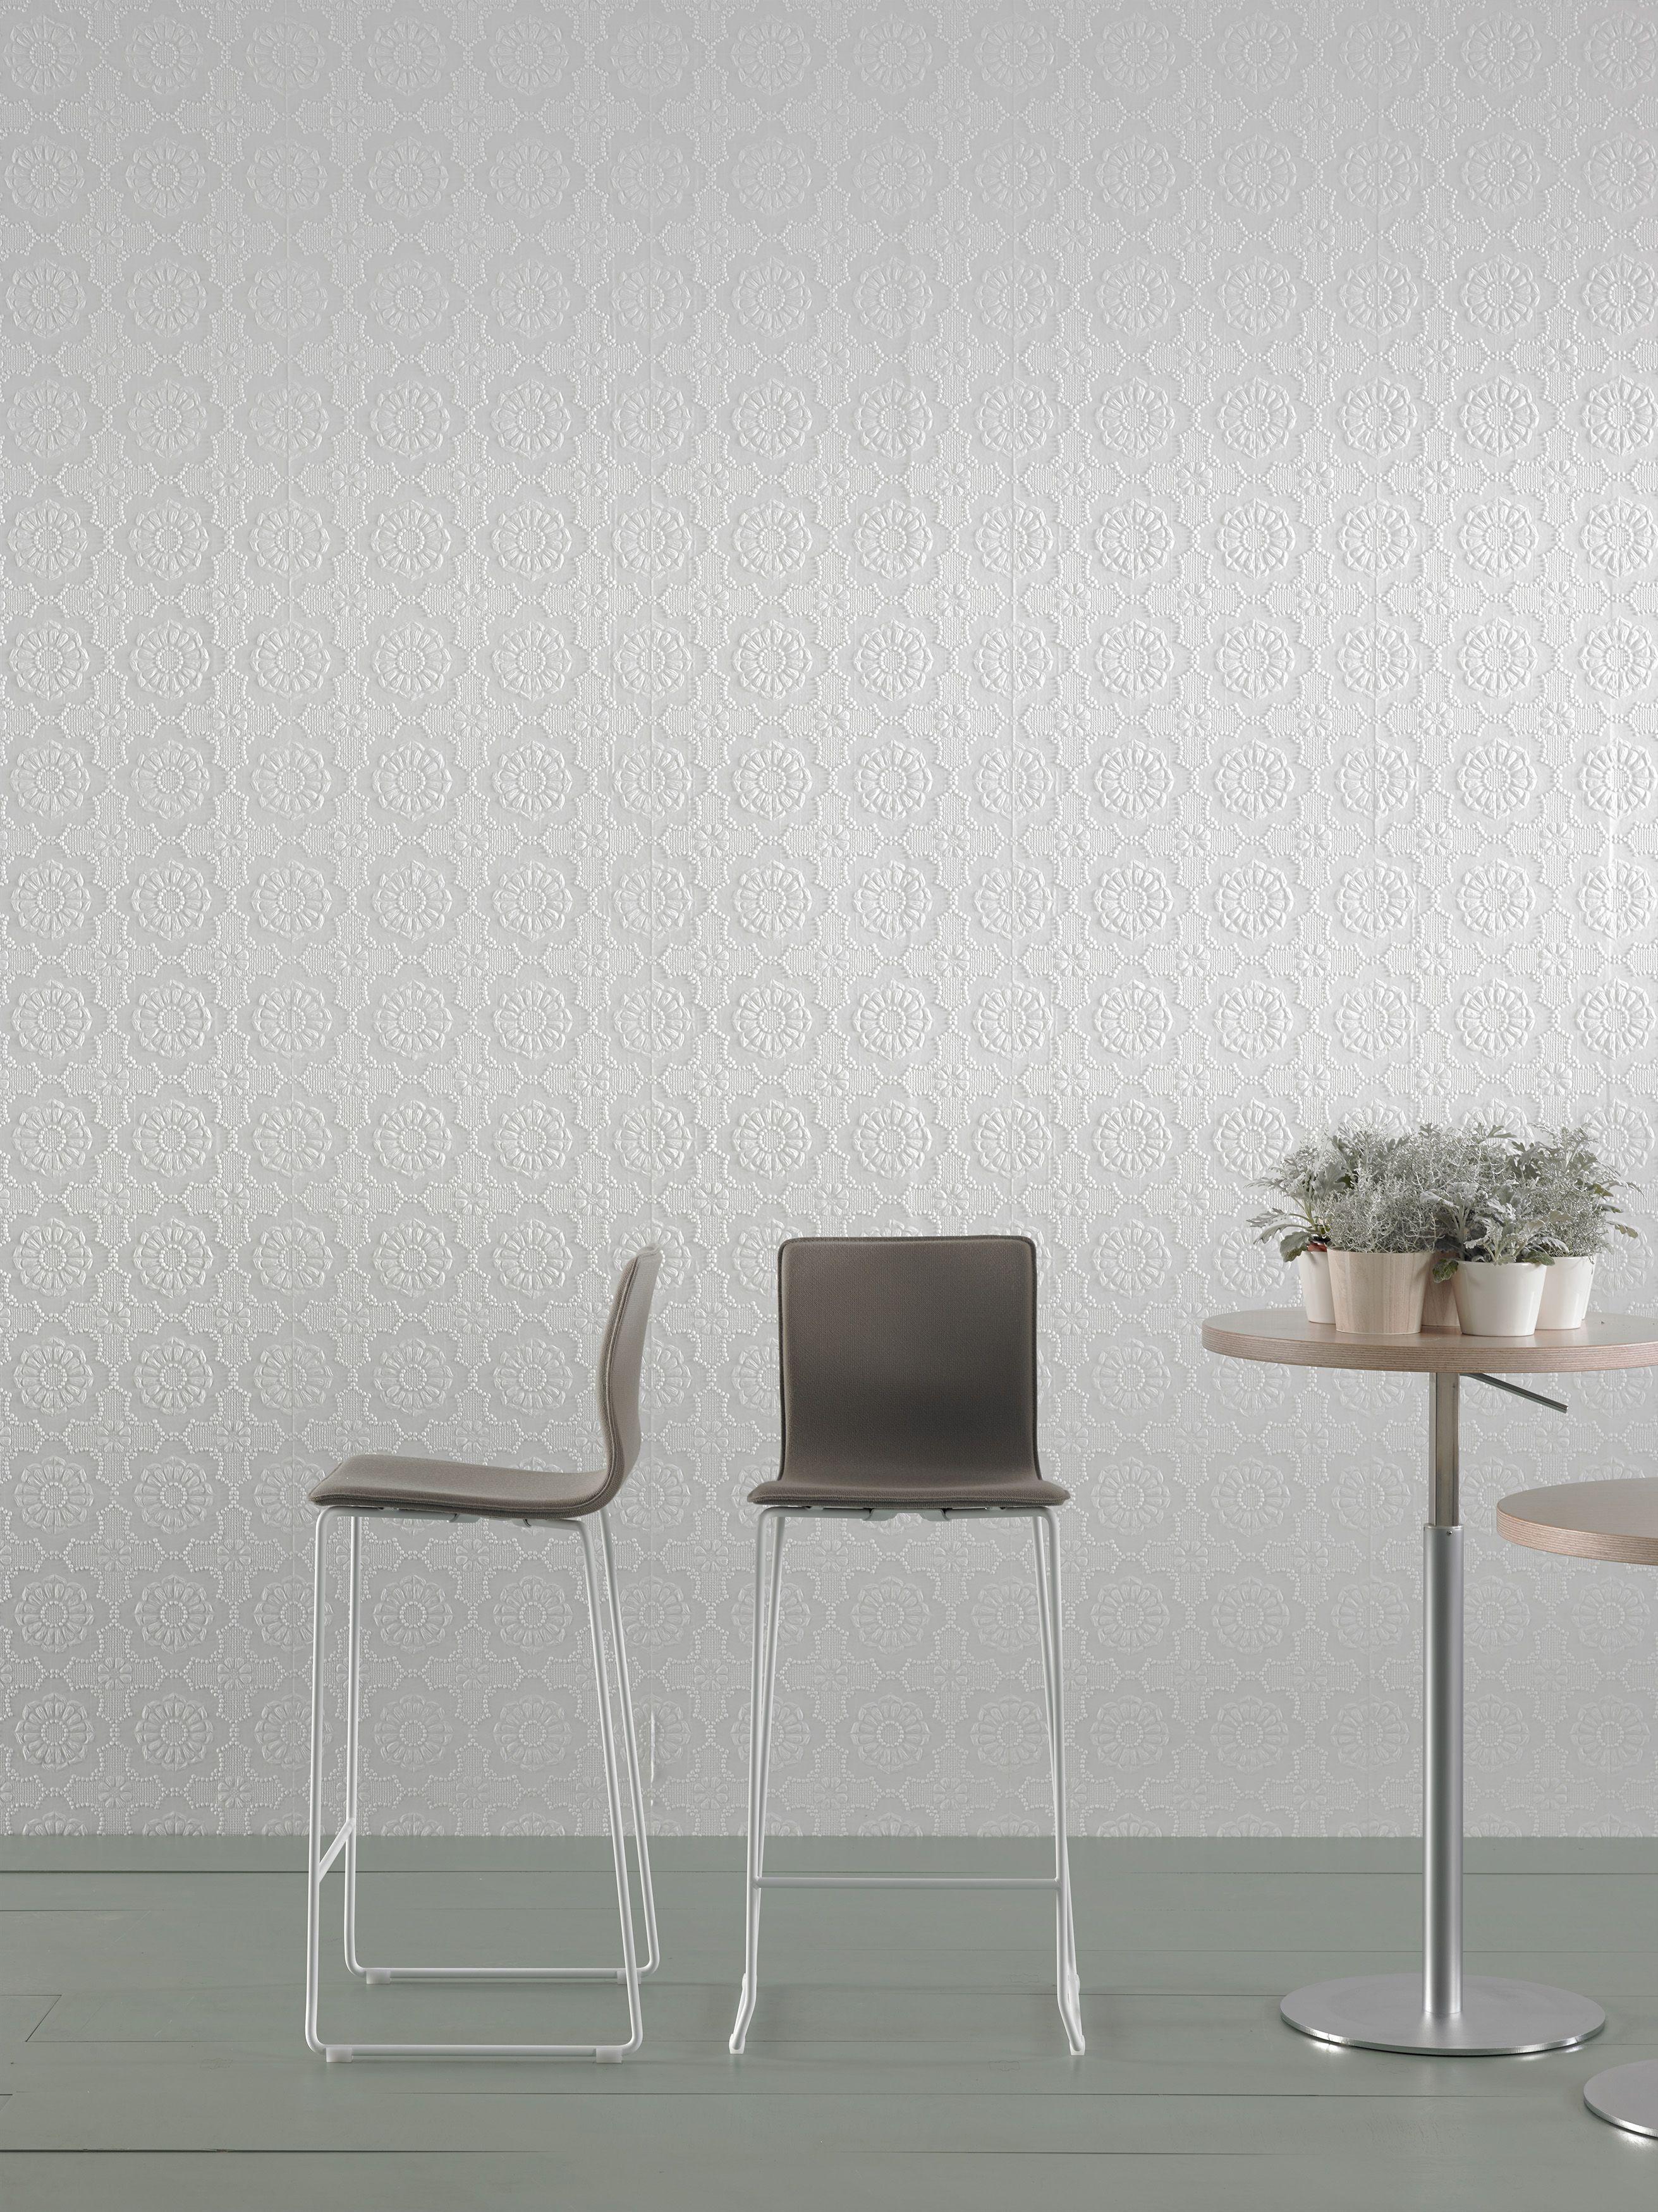 chaise de bar luge avec repose pieds dane 65 collection dane by ondarreta design ondarreta team. Black Bedroom Furniture Sets. Home Design Ideas